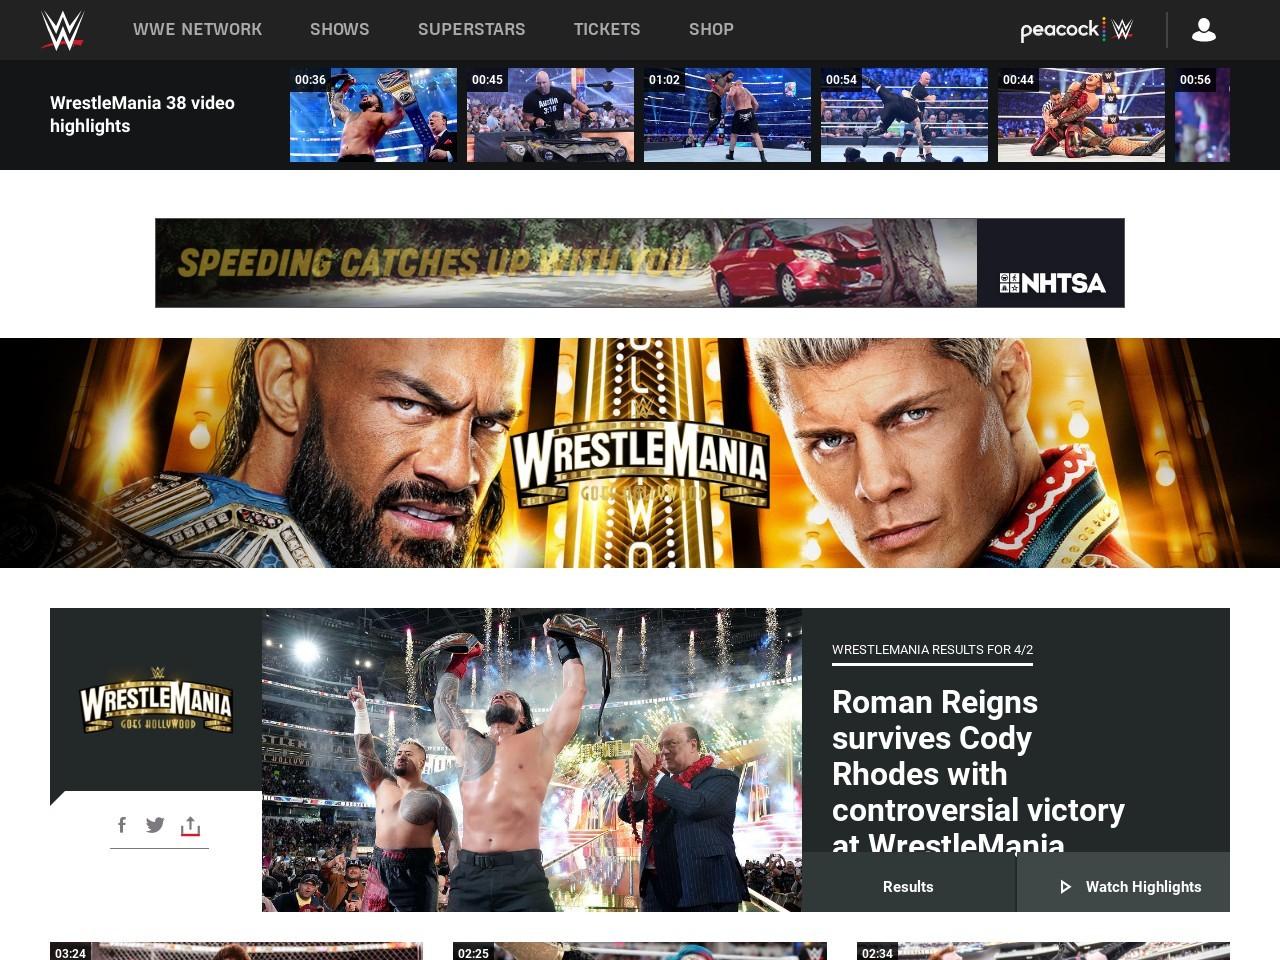 WWE.com: WrestleMania 30 WinMania Sweepstakes